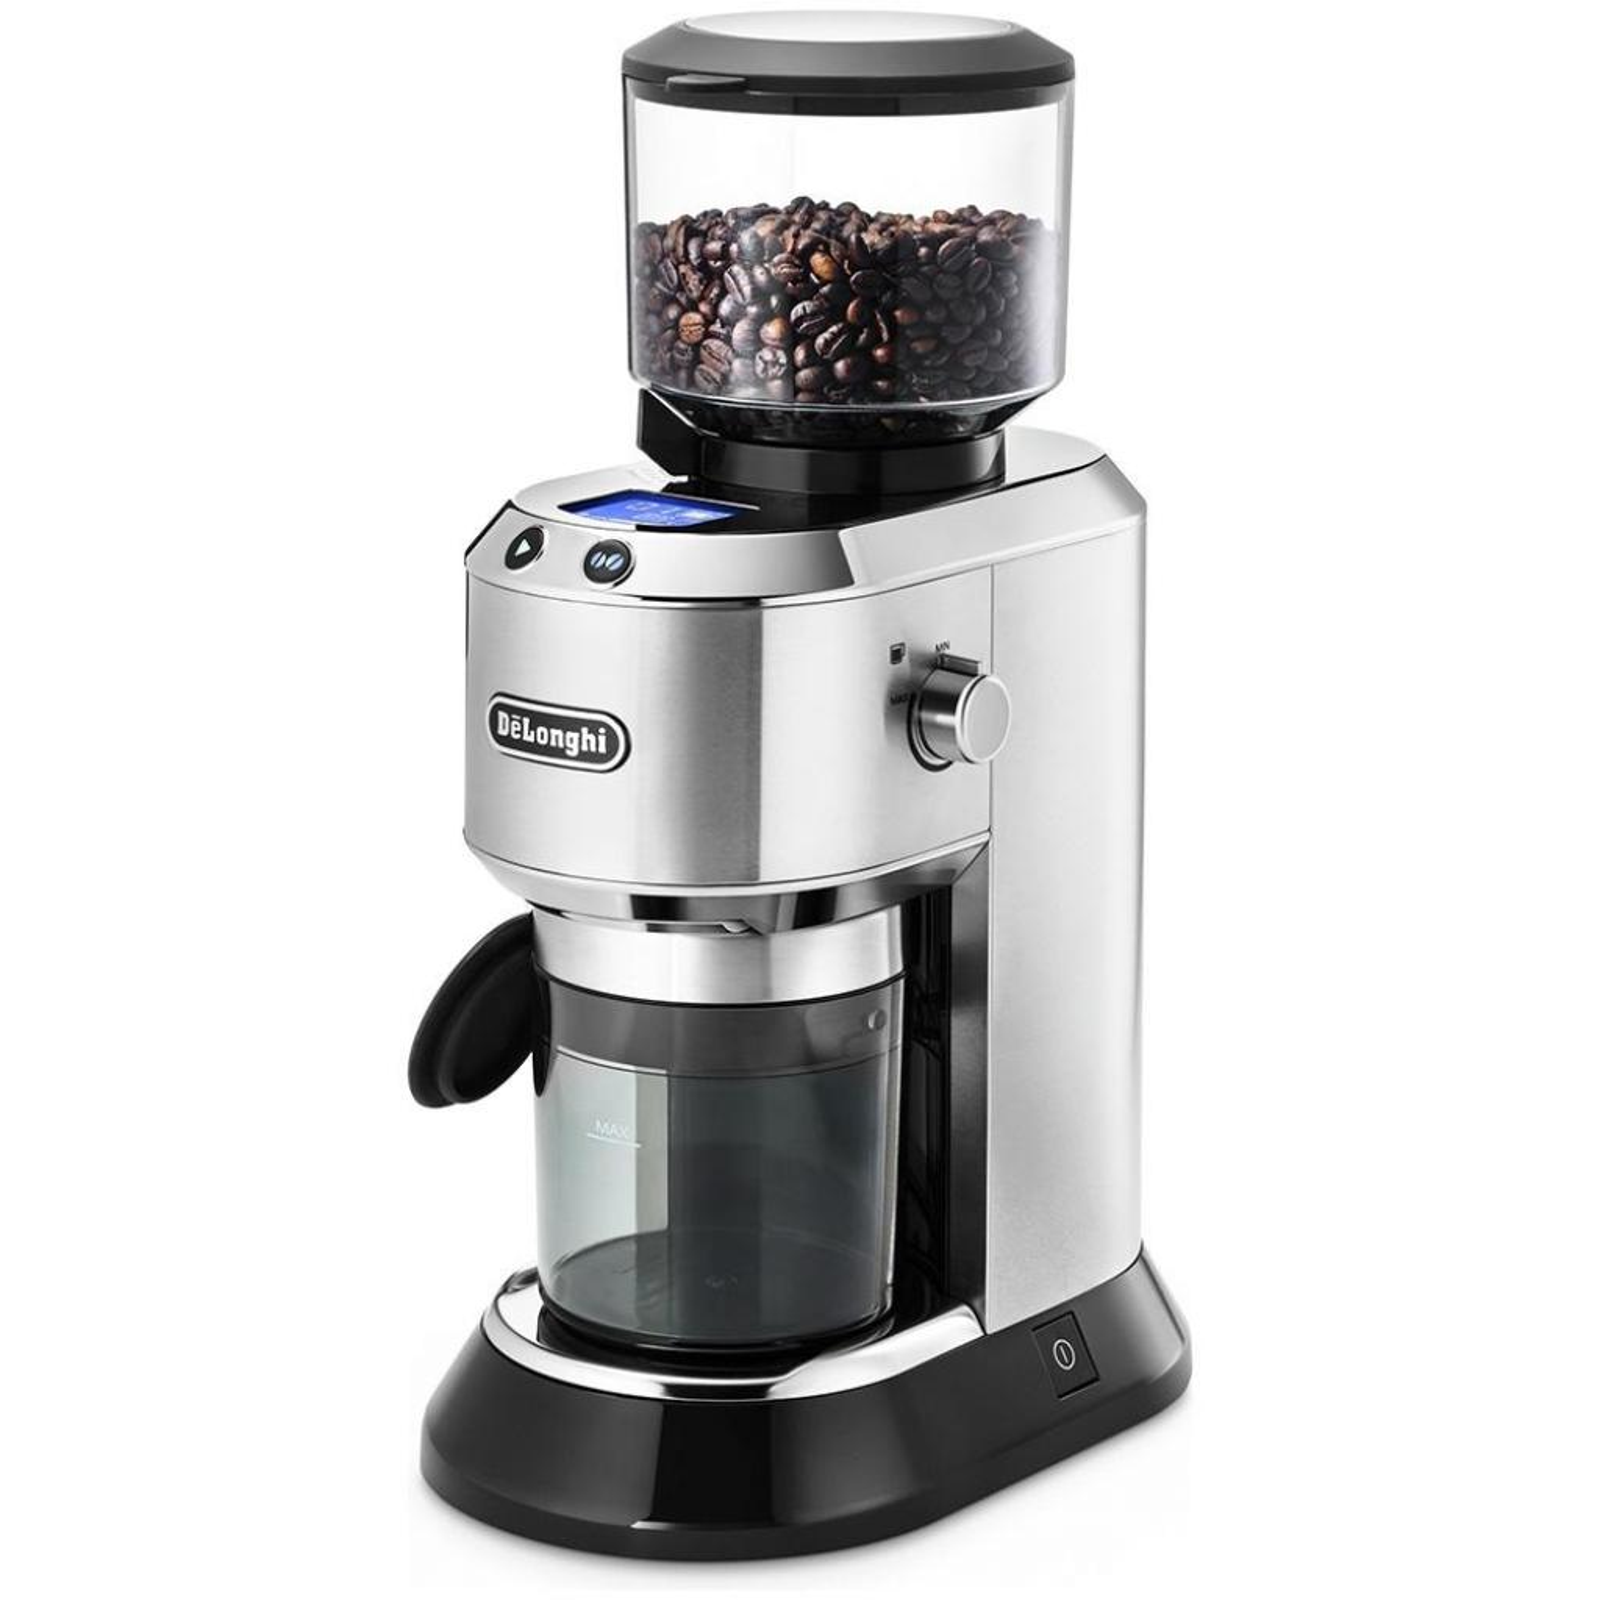 Кофемолка DeLonghi KG 521 M изображение 2